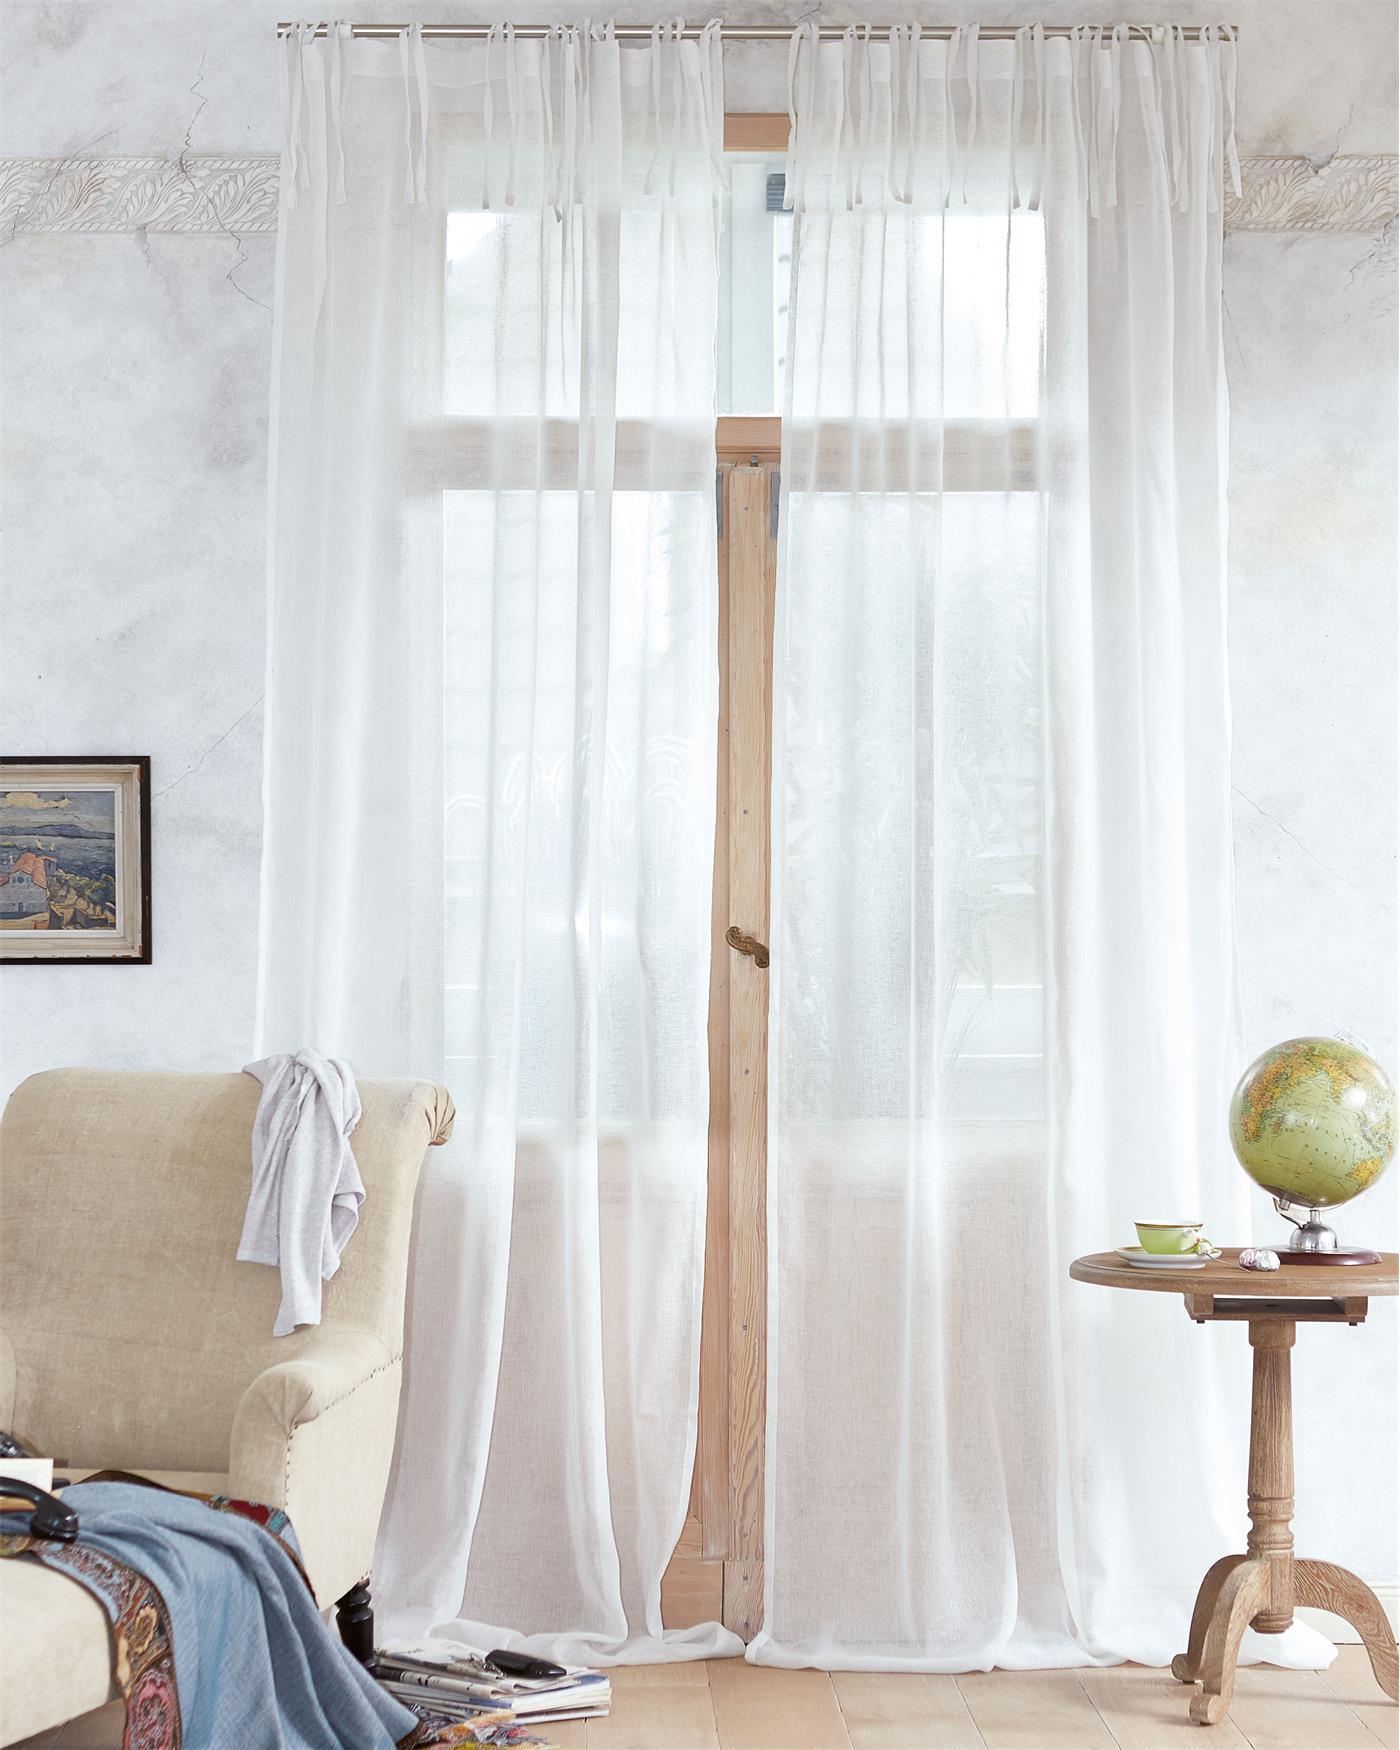 leinen gardinen transparent hcvc. Black Bedroom Furniture Sets. Home Design Ideas